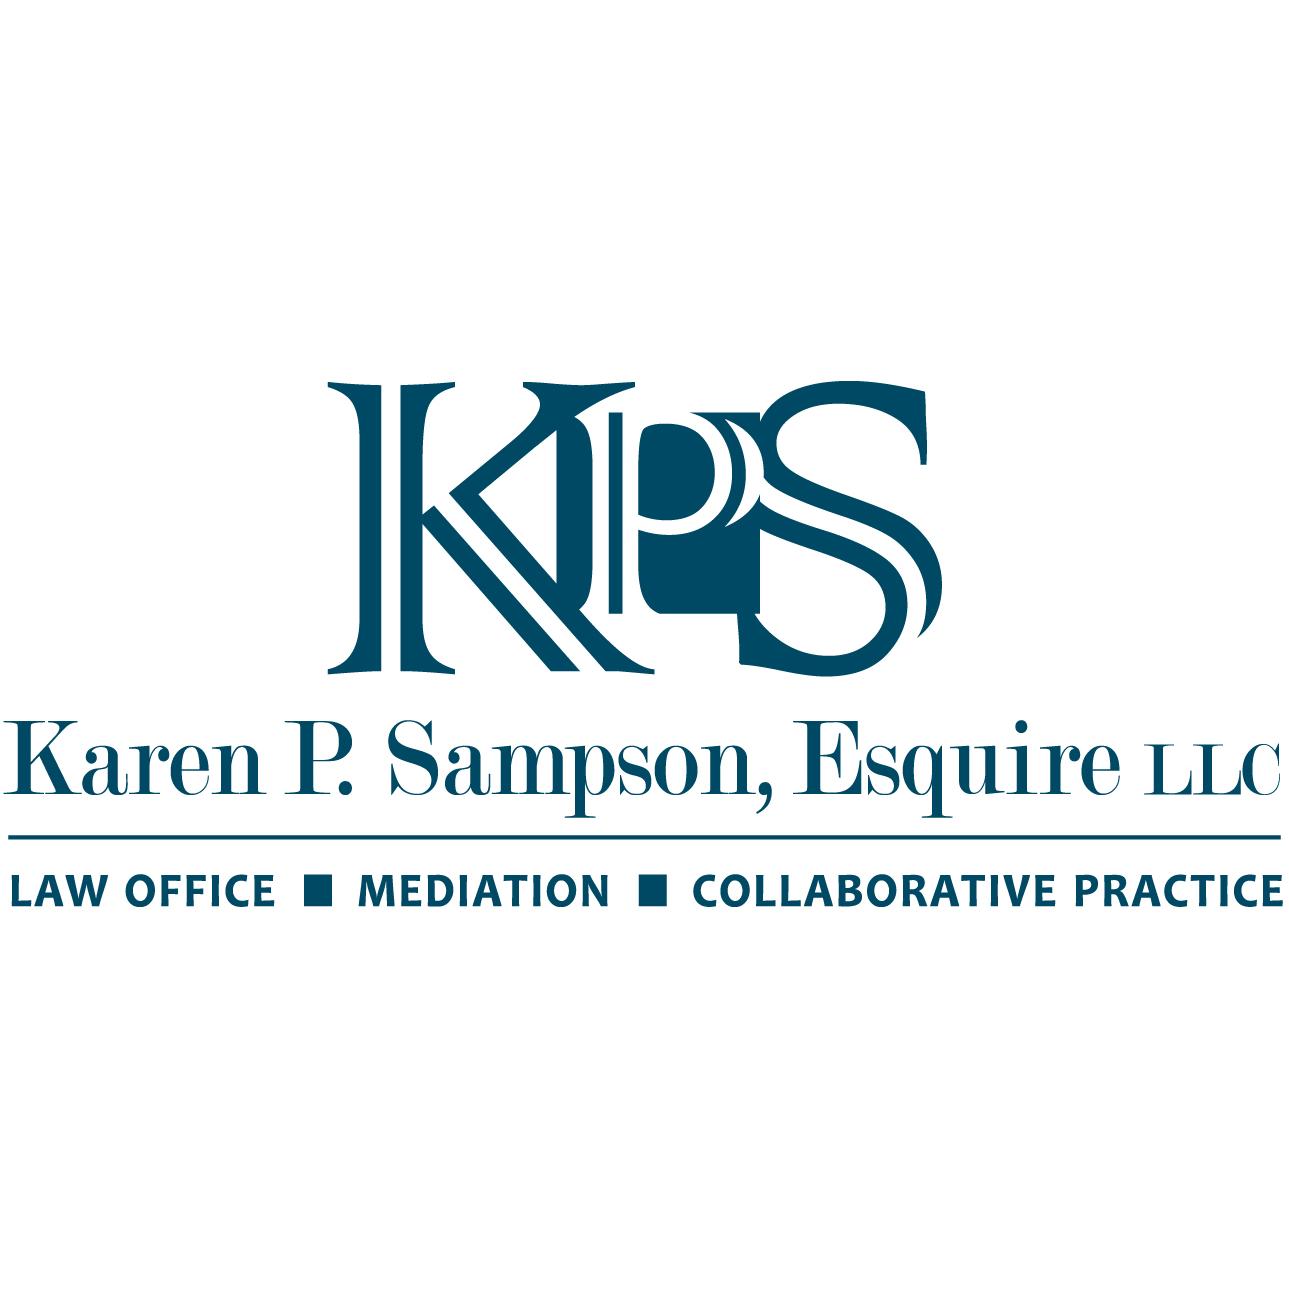 Karen P. Sampson, Esq. LLC